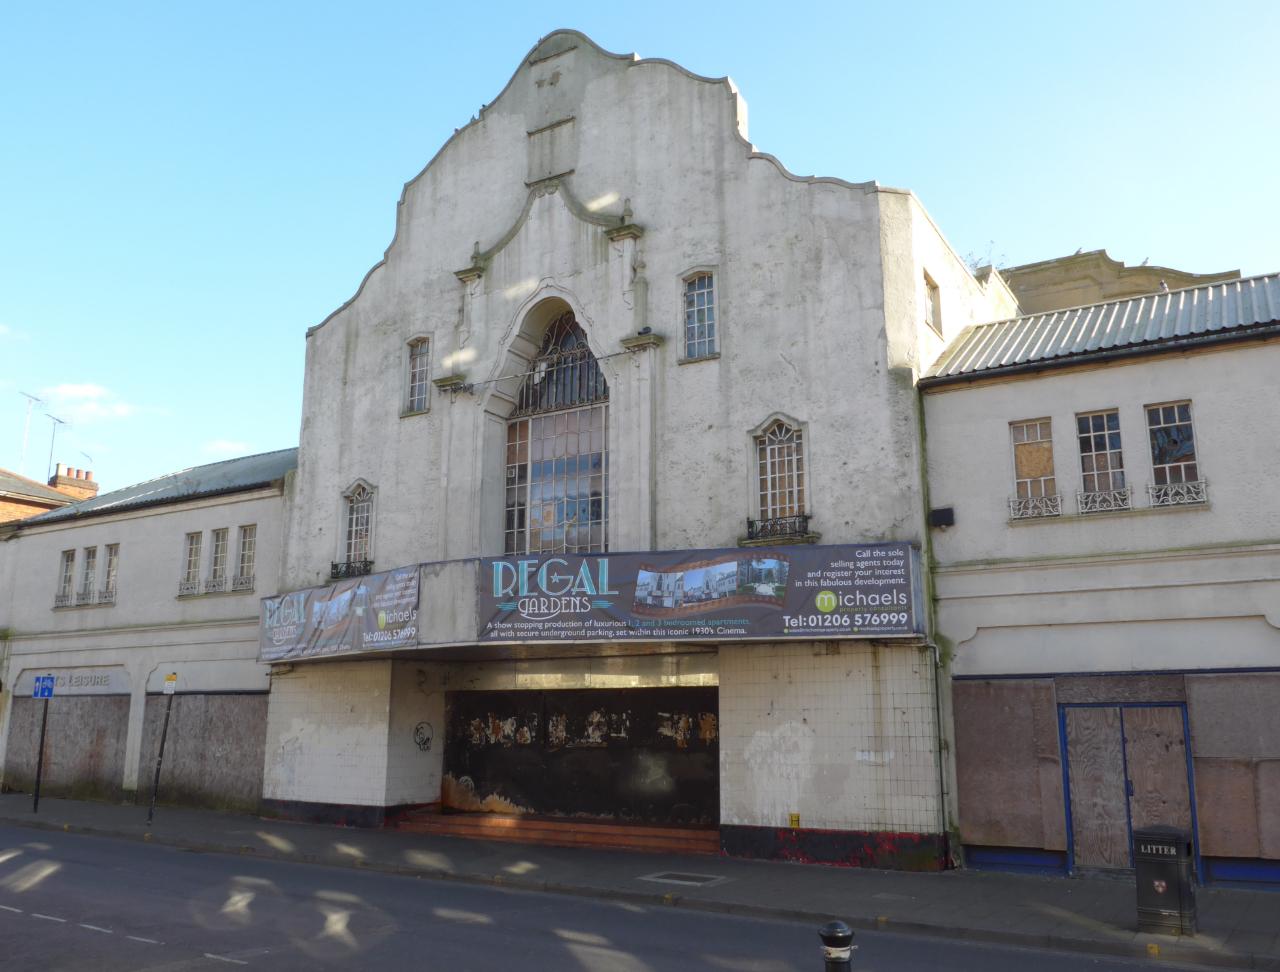 Old Odeon Cinema site, Colchester